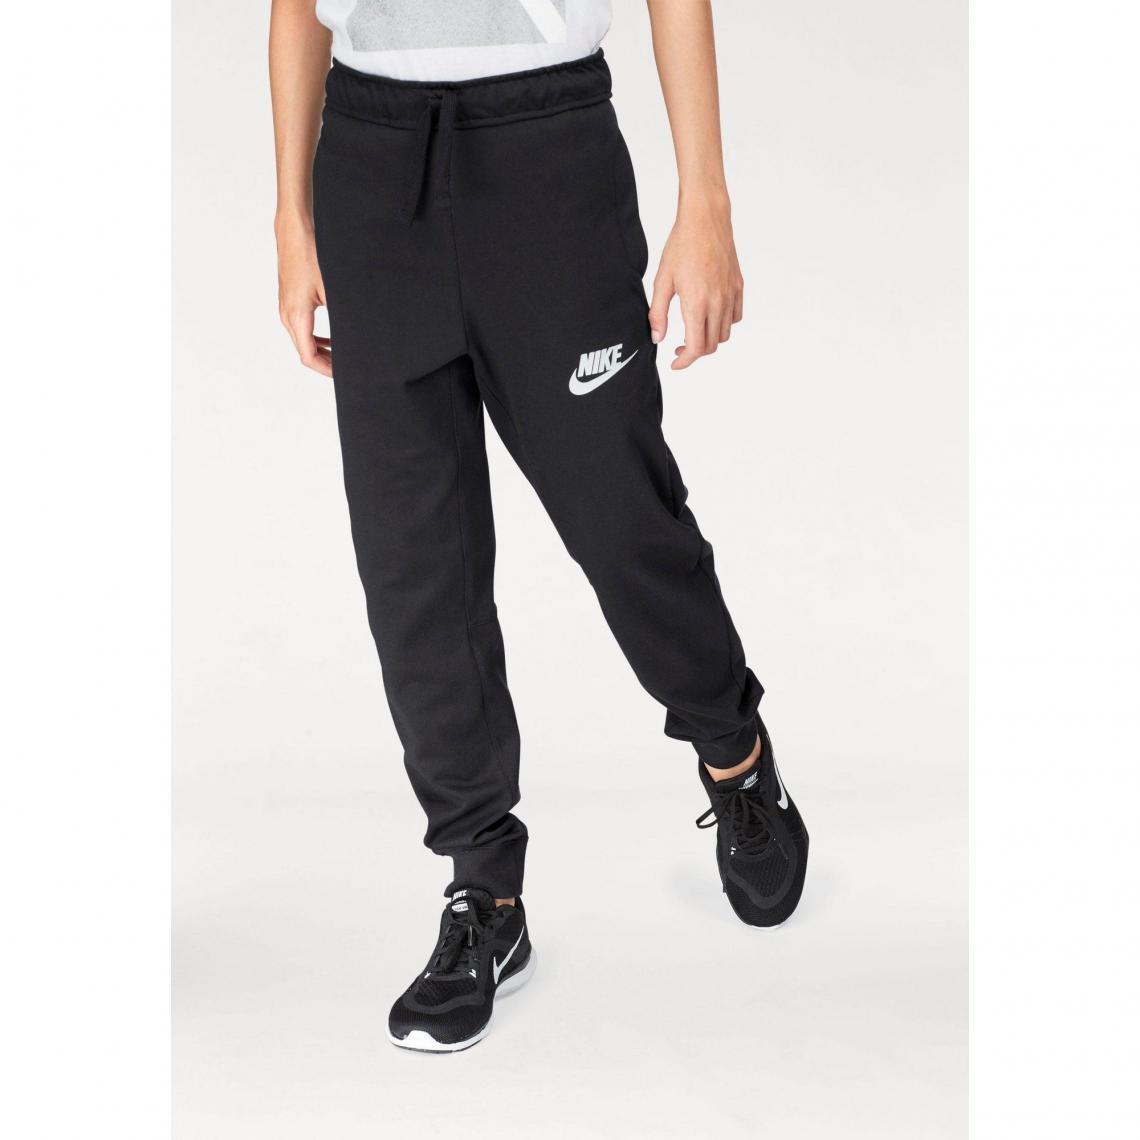 Pantalon de jogging junior Nike Sportswear AV15 - Noir Nike Enfant 41f13e0be1a0